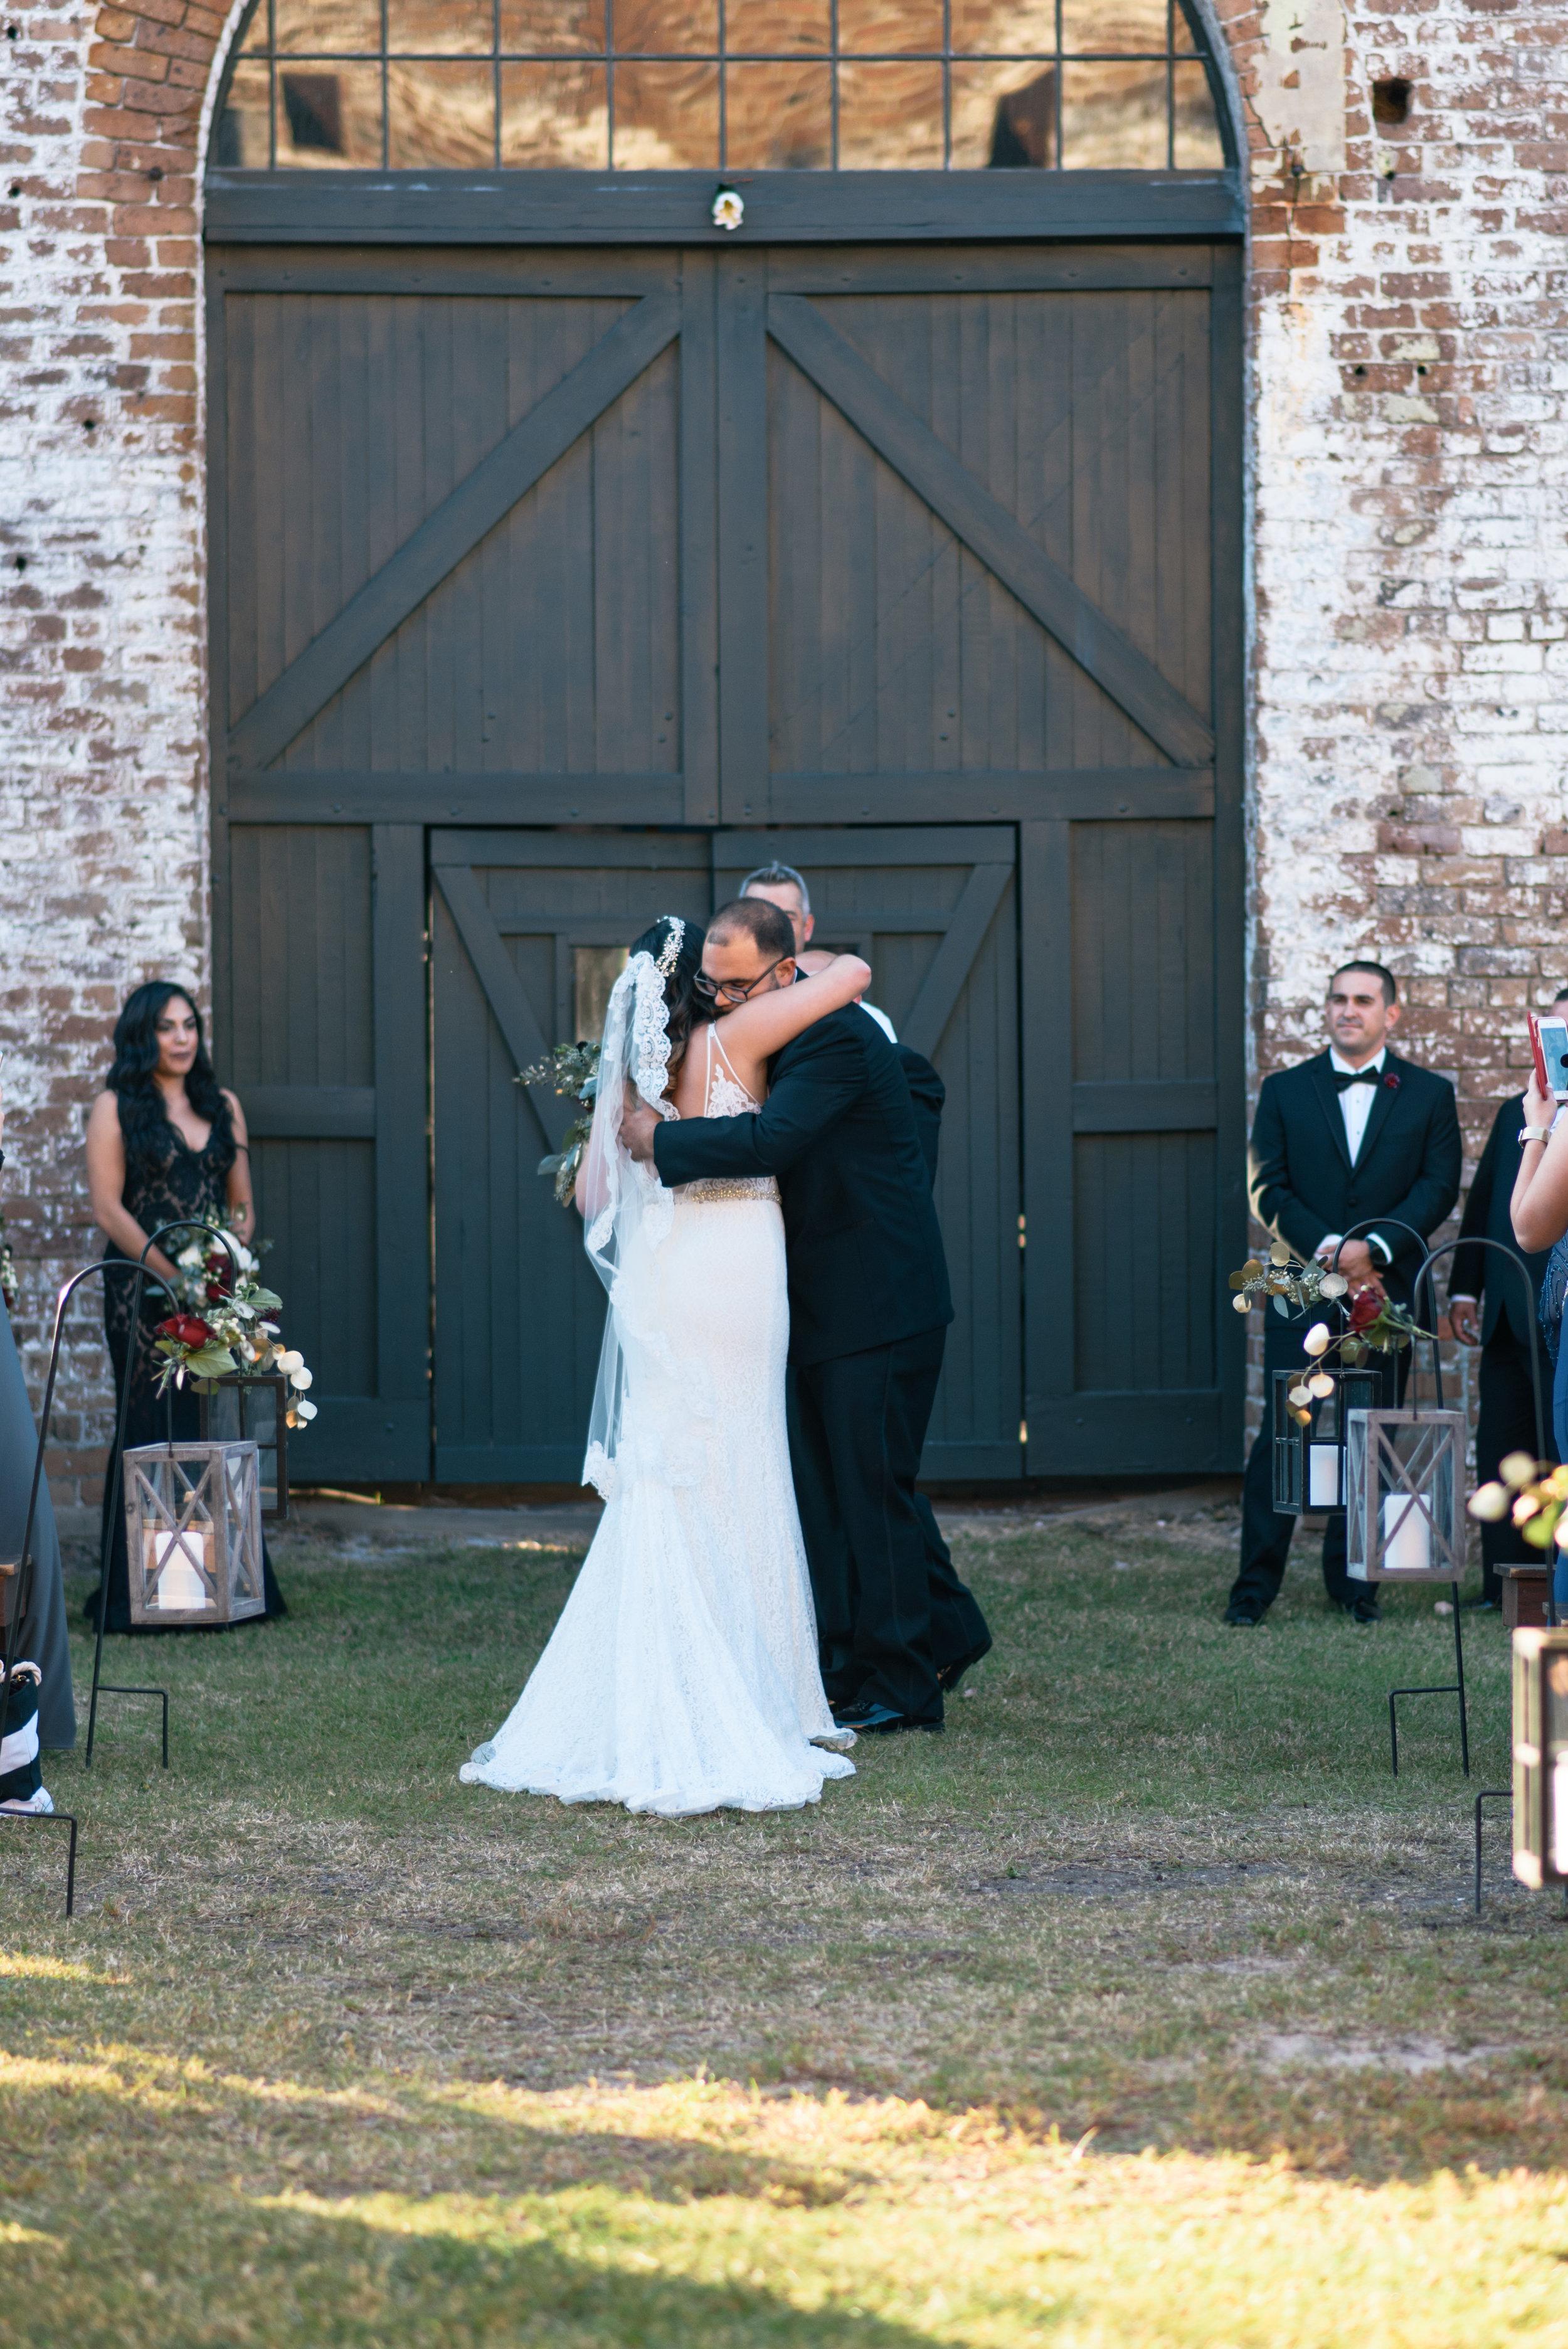 Iggy-and-yesenia-savannah-railroad-museum-wedding-meg-hill-photo- (464 of 1037).jpg